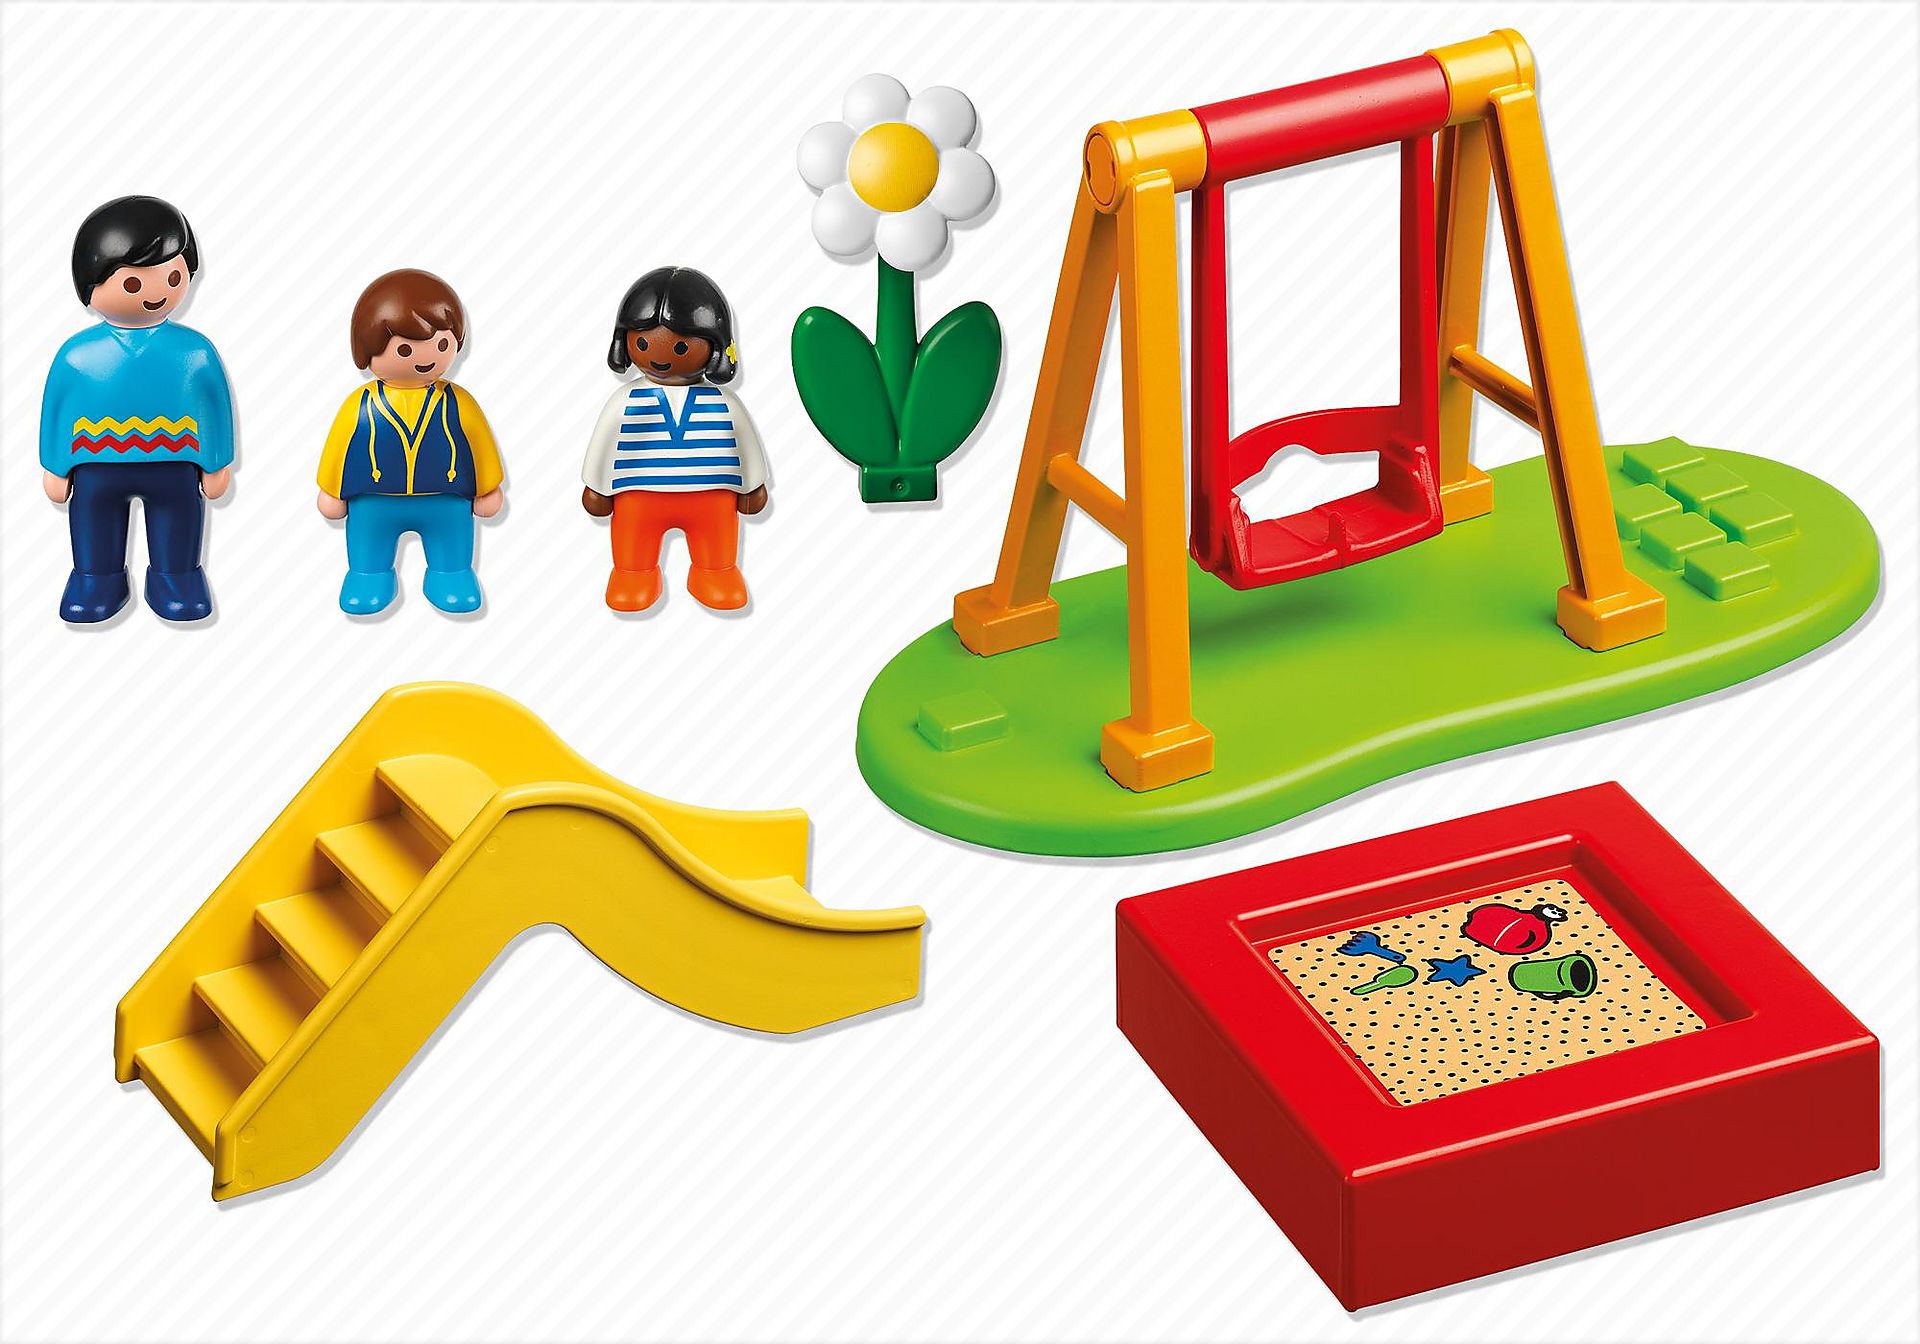 6785 Parco giochi zoom image3